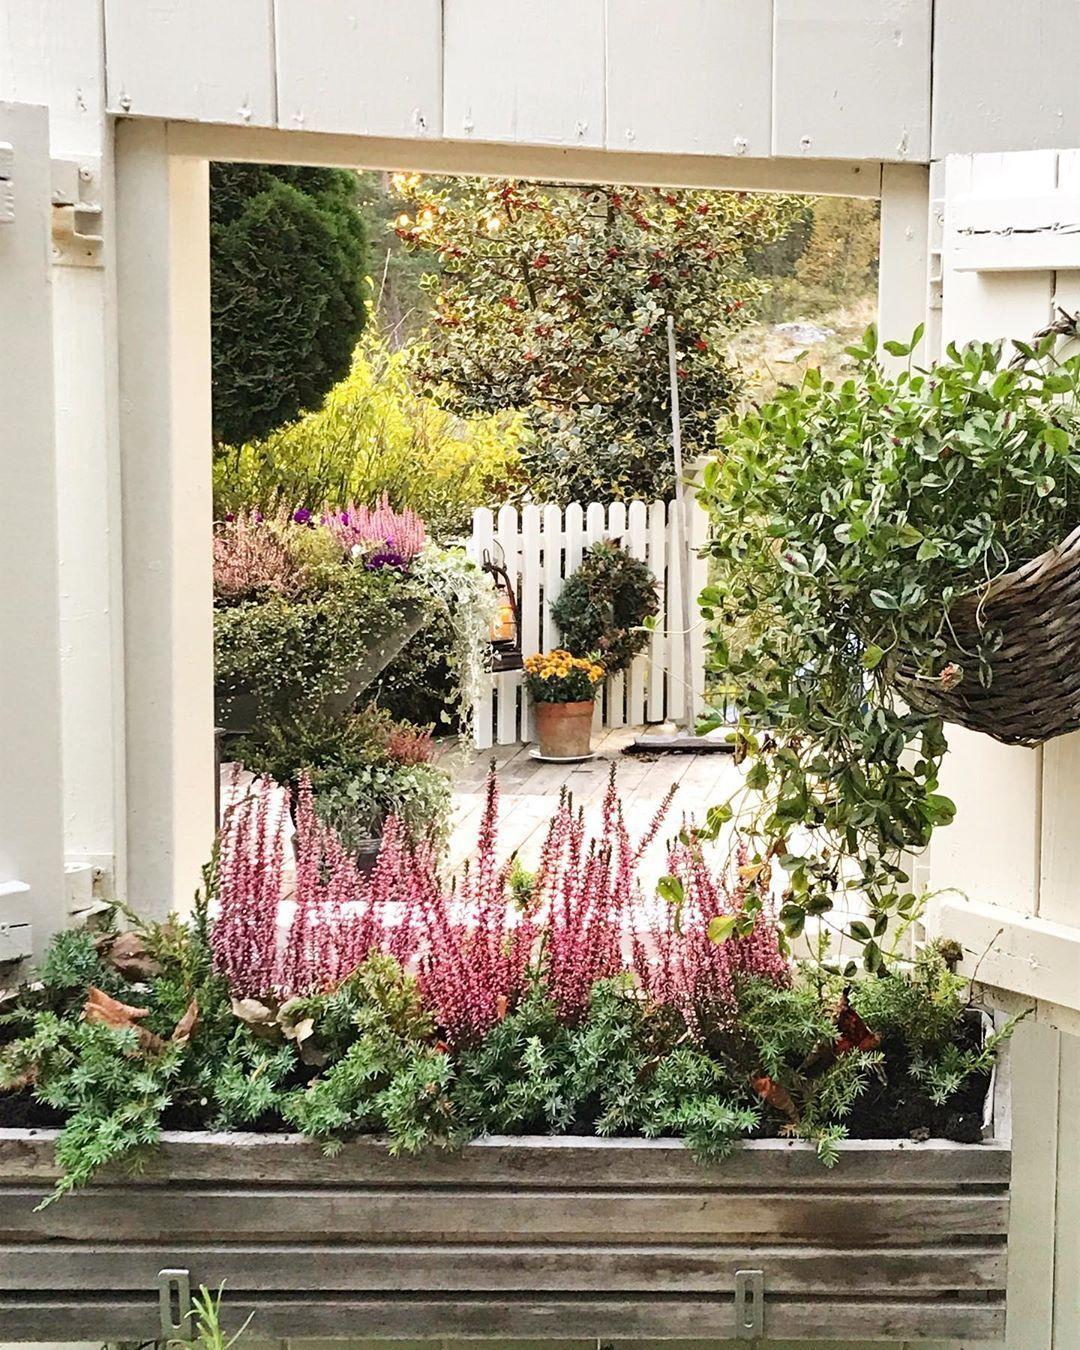 Høst i haven 🍂________________________________________#høst #minhage #uterom #hage #blomsterglede #lyng #utelivoghagerom #garden #gardendecor #gardenlovers #garten #gartendekoration #minlandstil #landliv #landligstil #hverdagsglede #minmagi #outdoordecor #mycountrygarden #landhausgarten #minträdgård #autumn #trädgårdsliv #homeandgarden #meinschönergarten #vintagegarden #instagarden #countrystyle #trädgårdsinspiration #fall